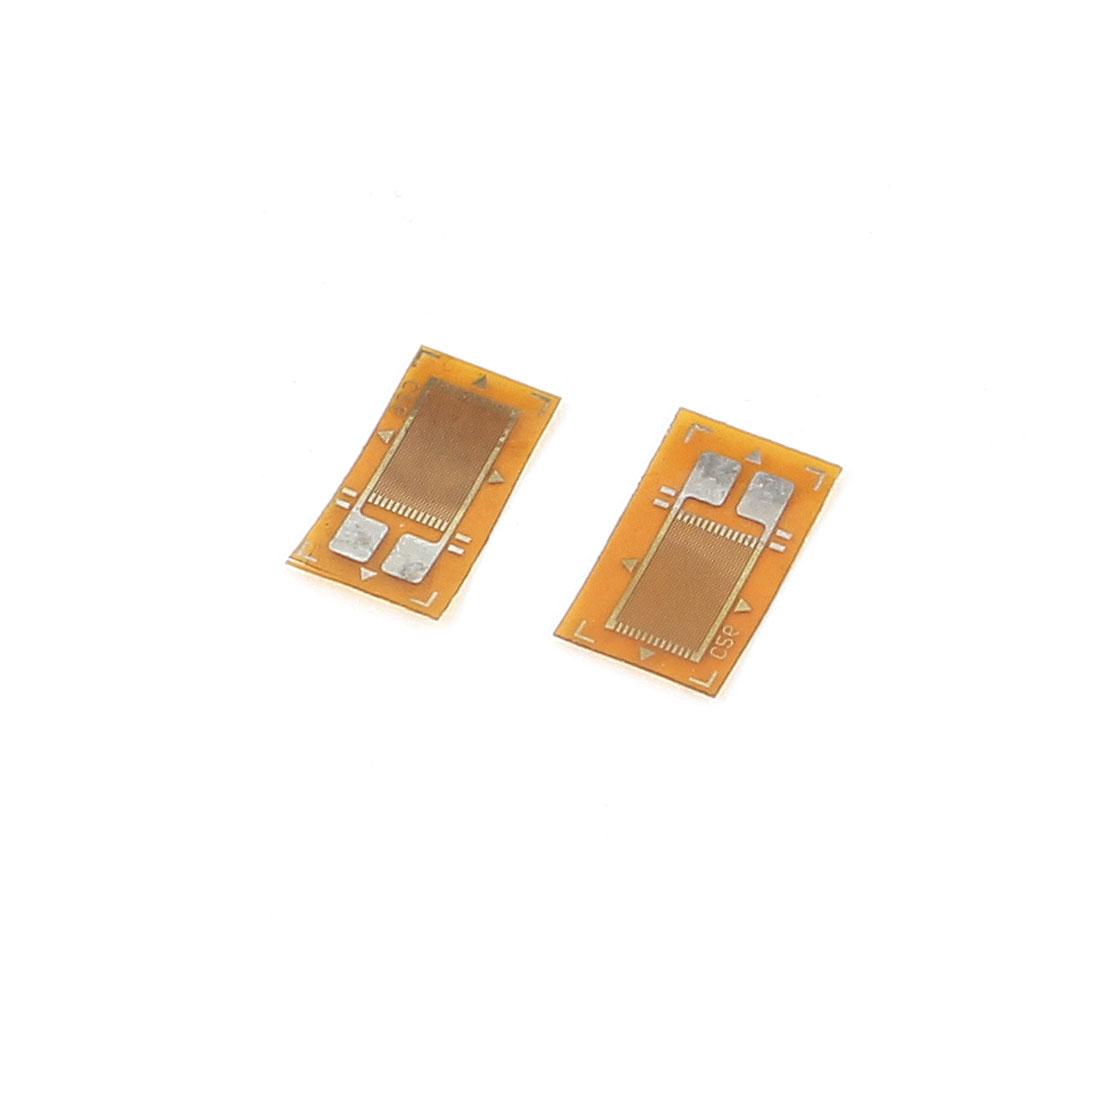 2 PCS BF350 Precision Pressure Resistive Strain Gauge for Sensor Load Cell